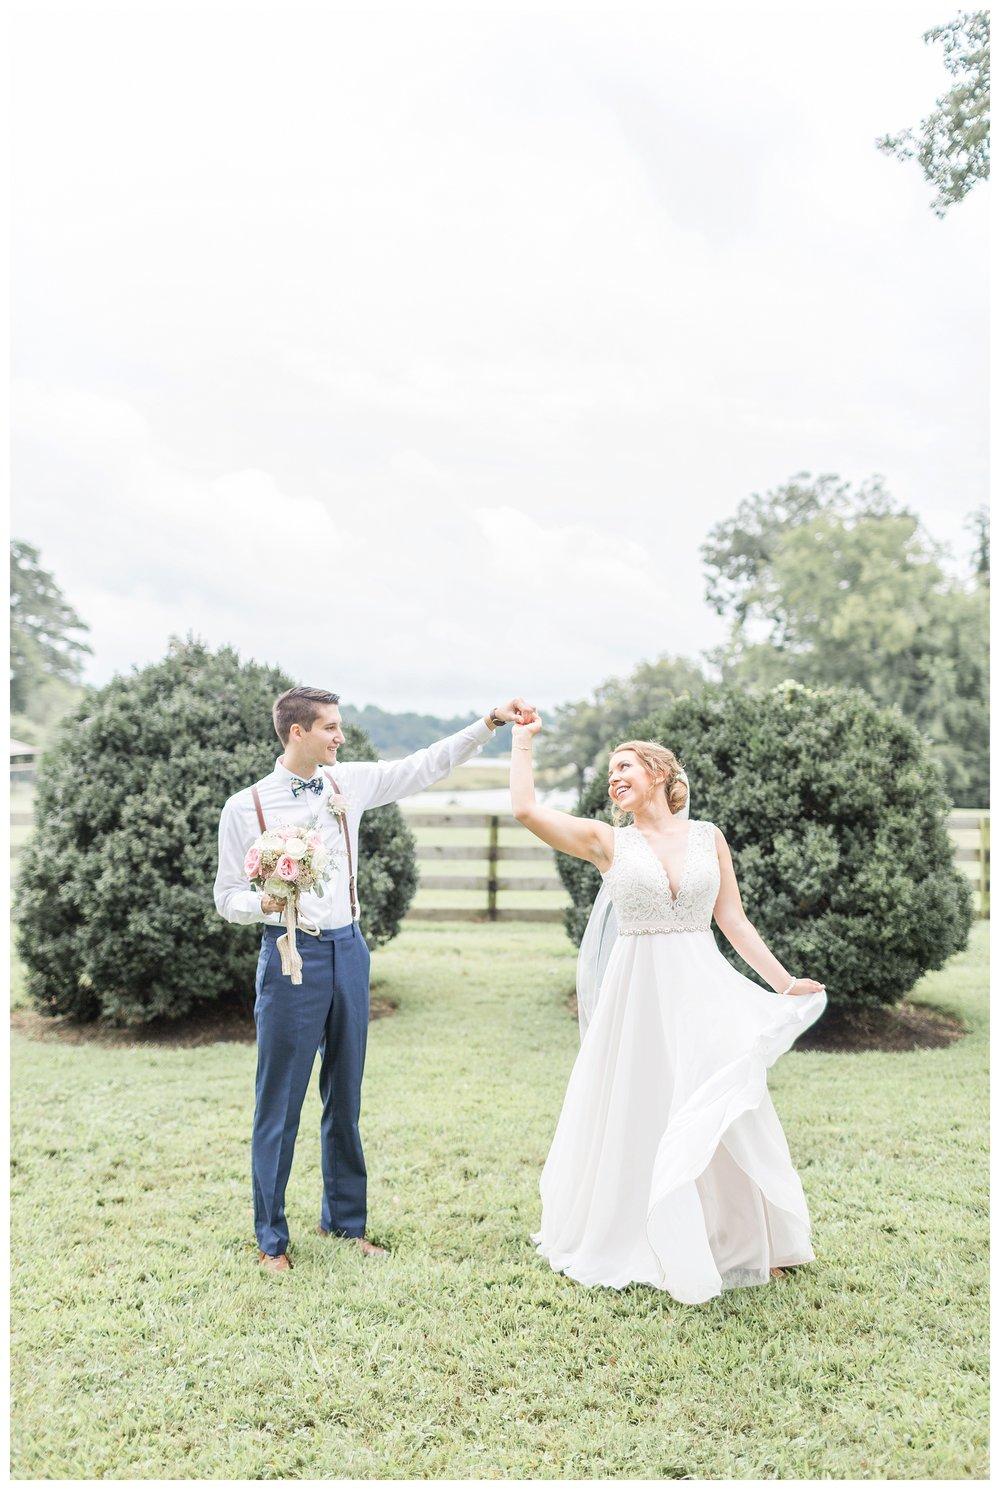 Pippin Hill Wedding Photographer_0001.jpg